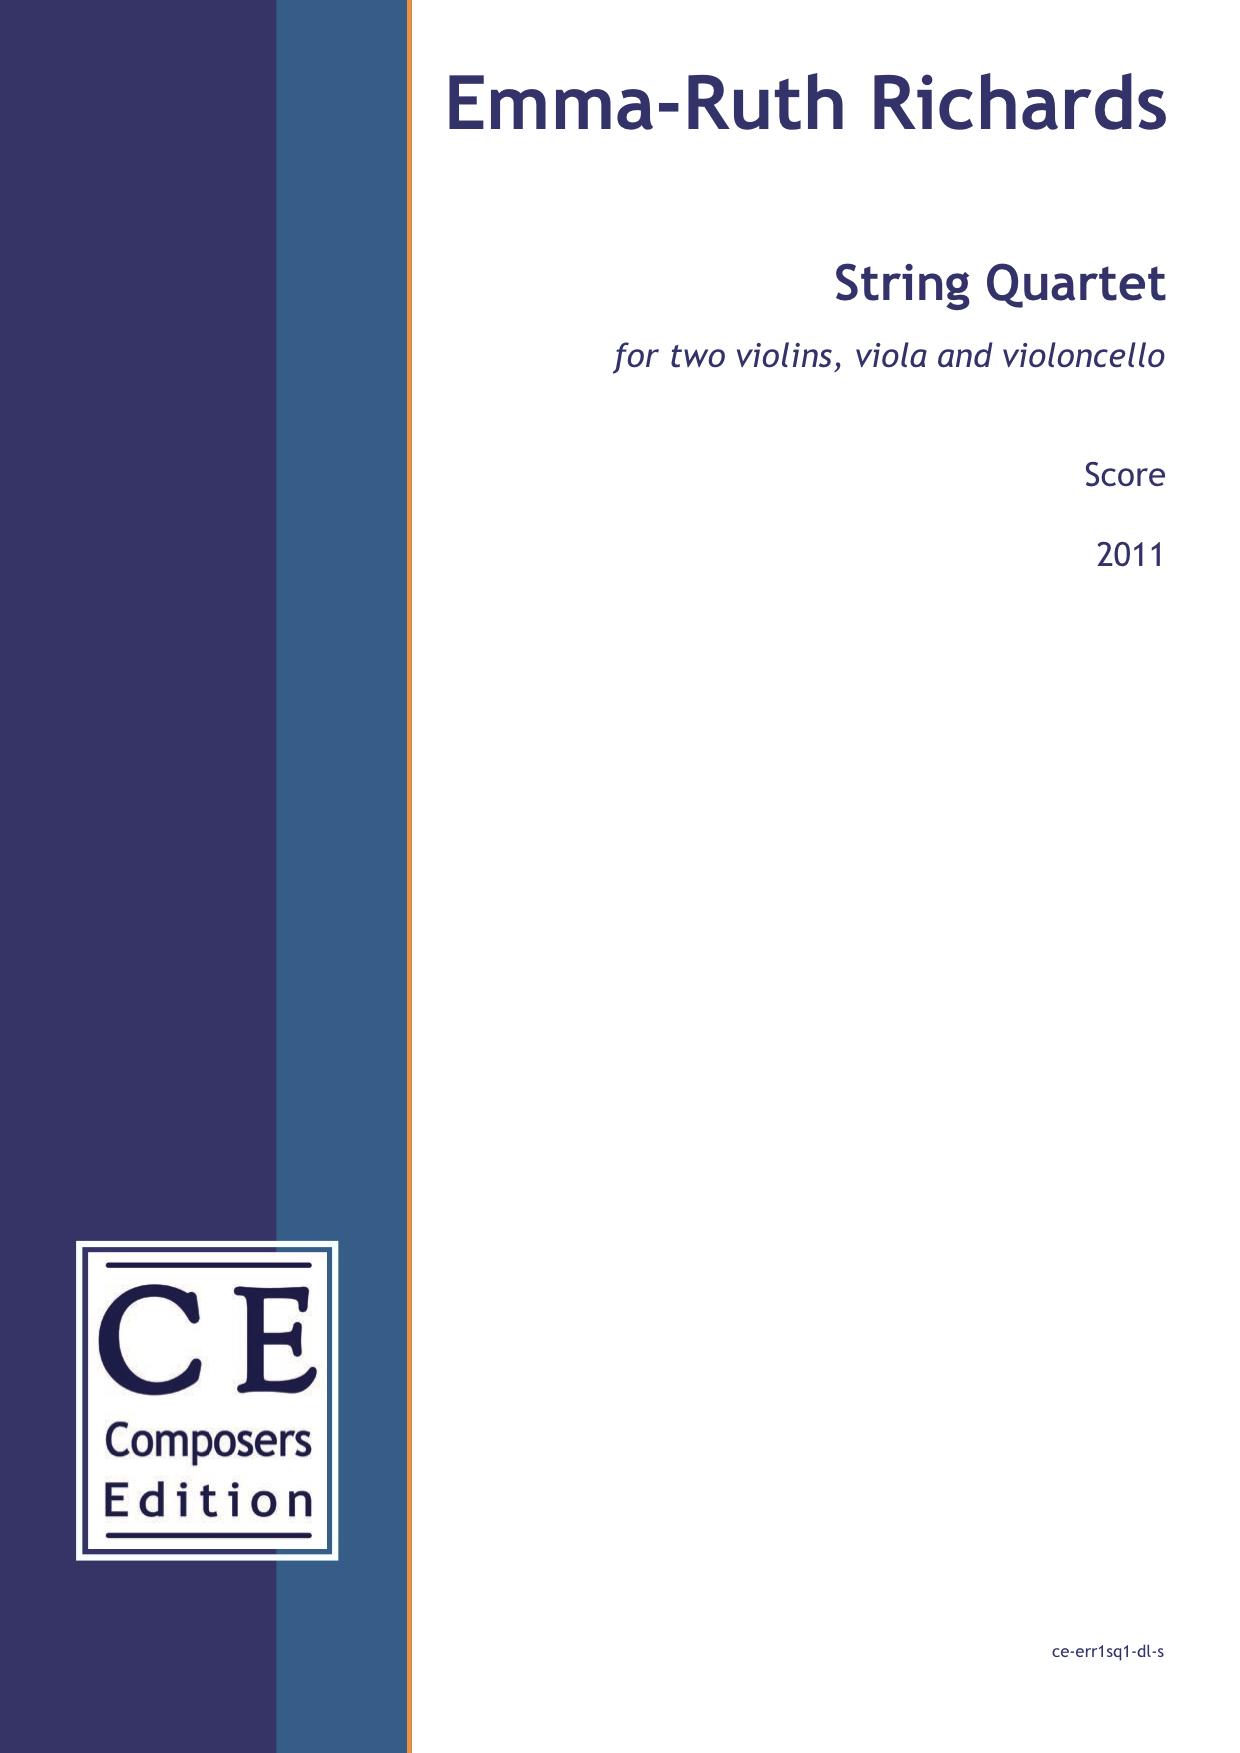 Emma-Ruth Richards: String Quartet for two violins, viola and violoncello